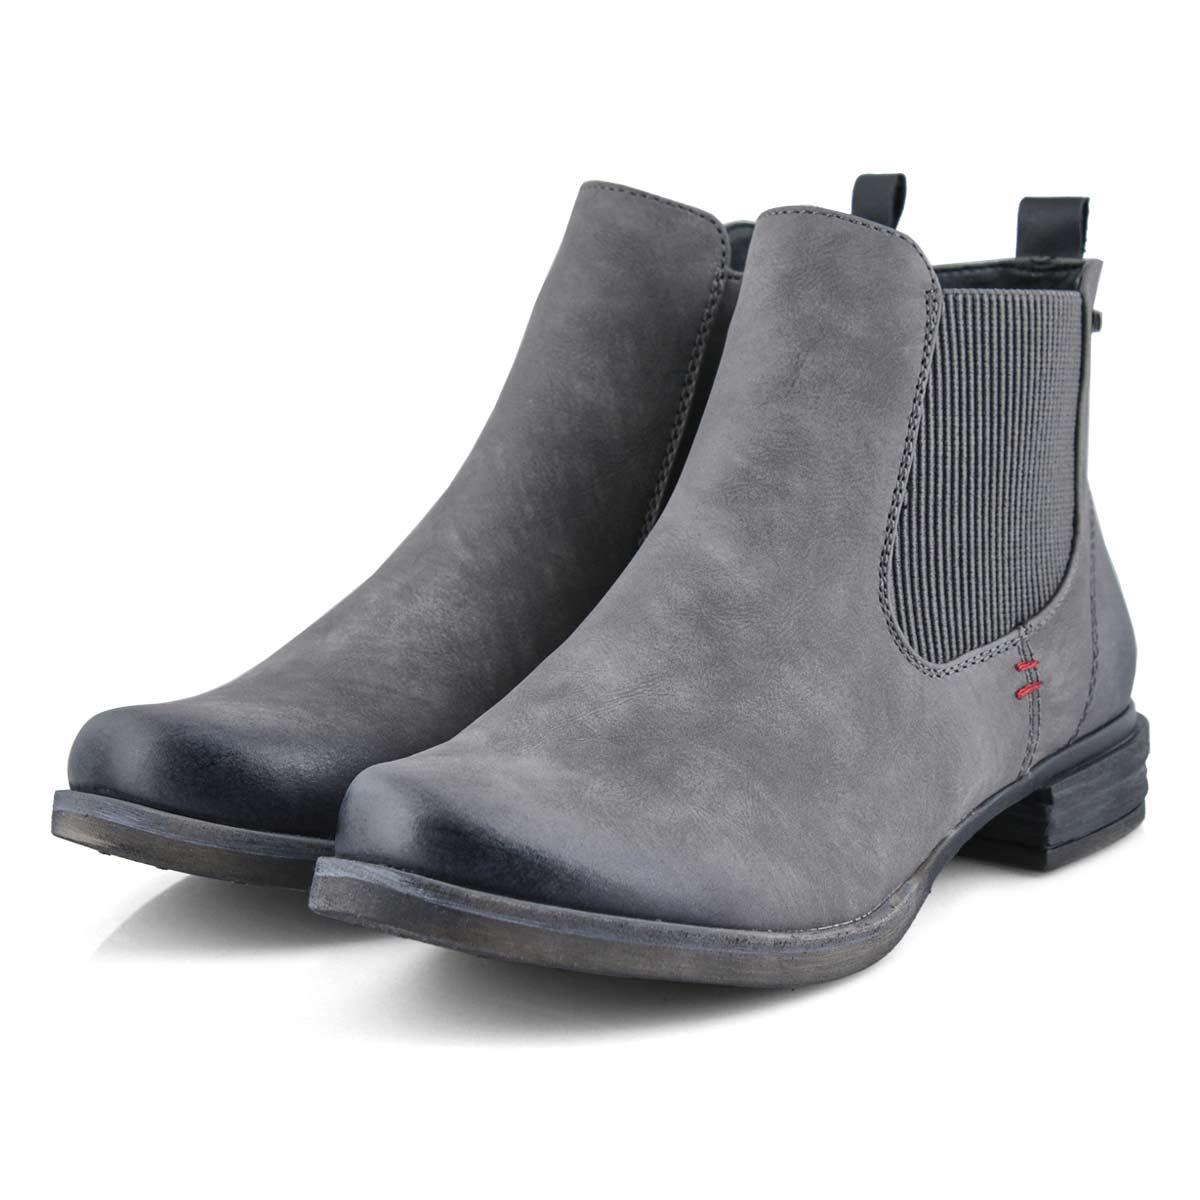 Lds Venus 37 grey chelsea boot